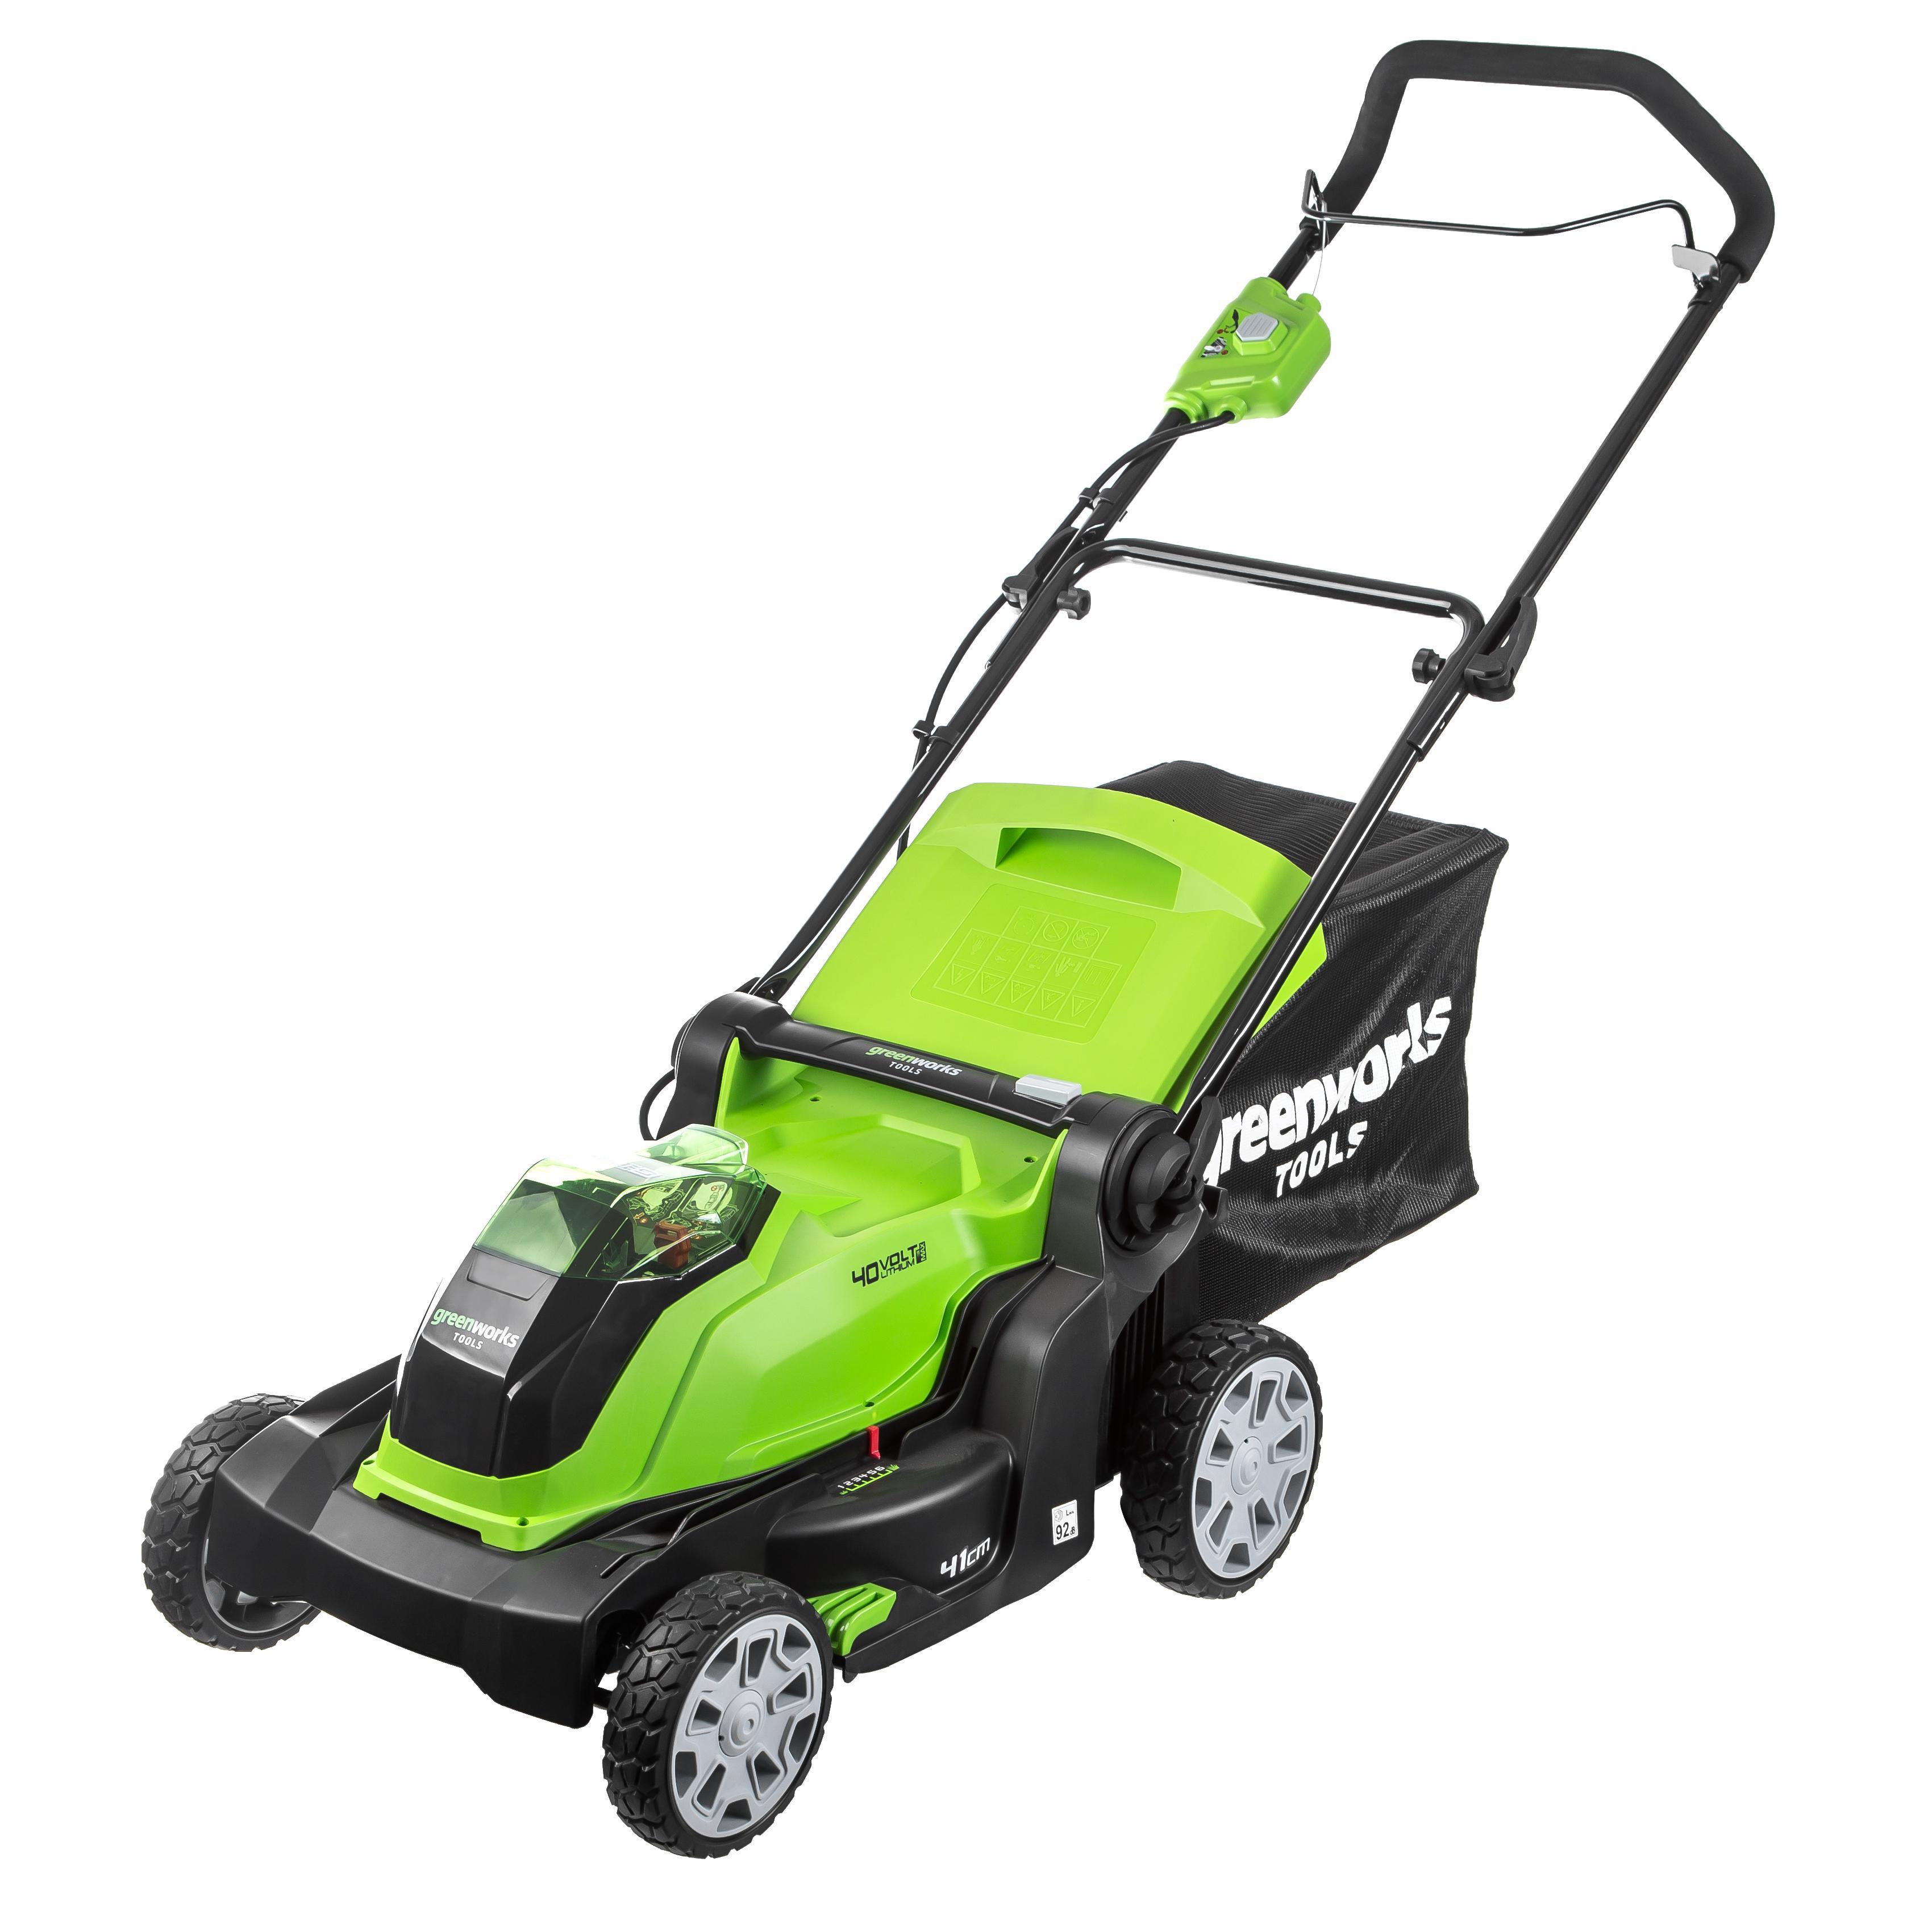 Аккумуляторная газонокосилка Greenworks G40lm40 (2504707) 1акк 40В 4Ач + ЗУ